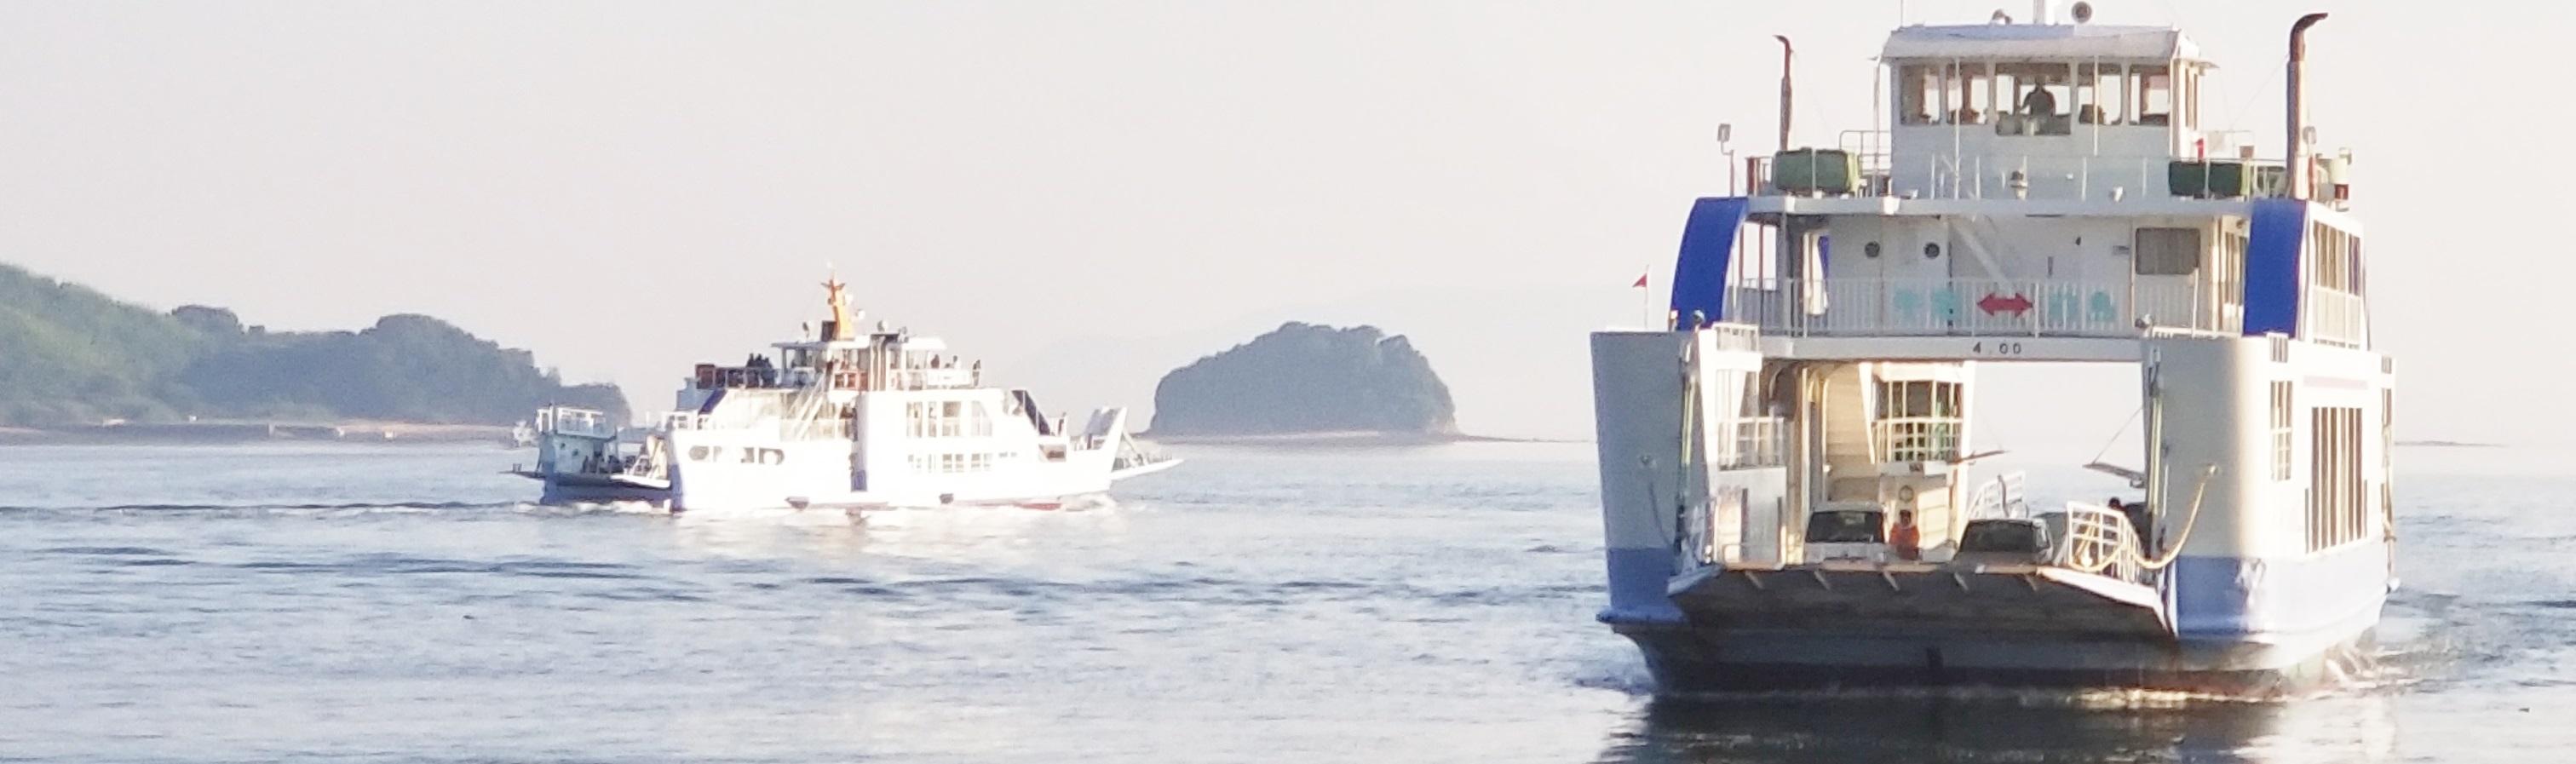 ferry_201807151